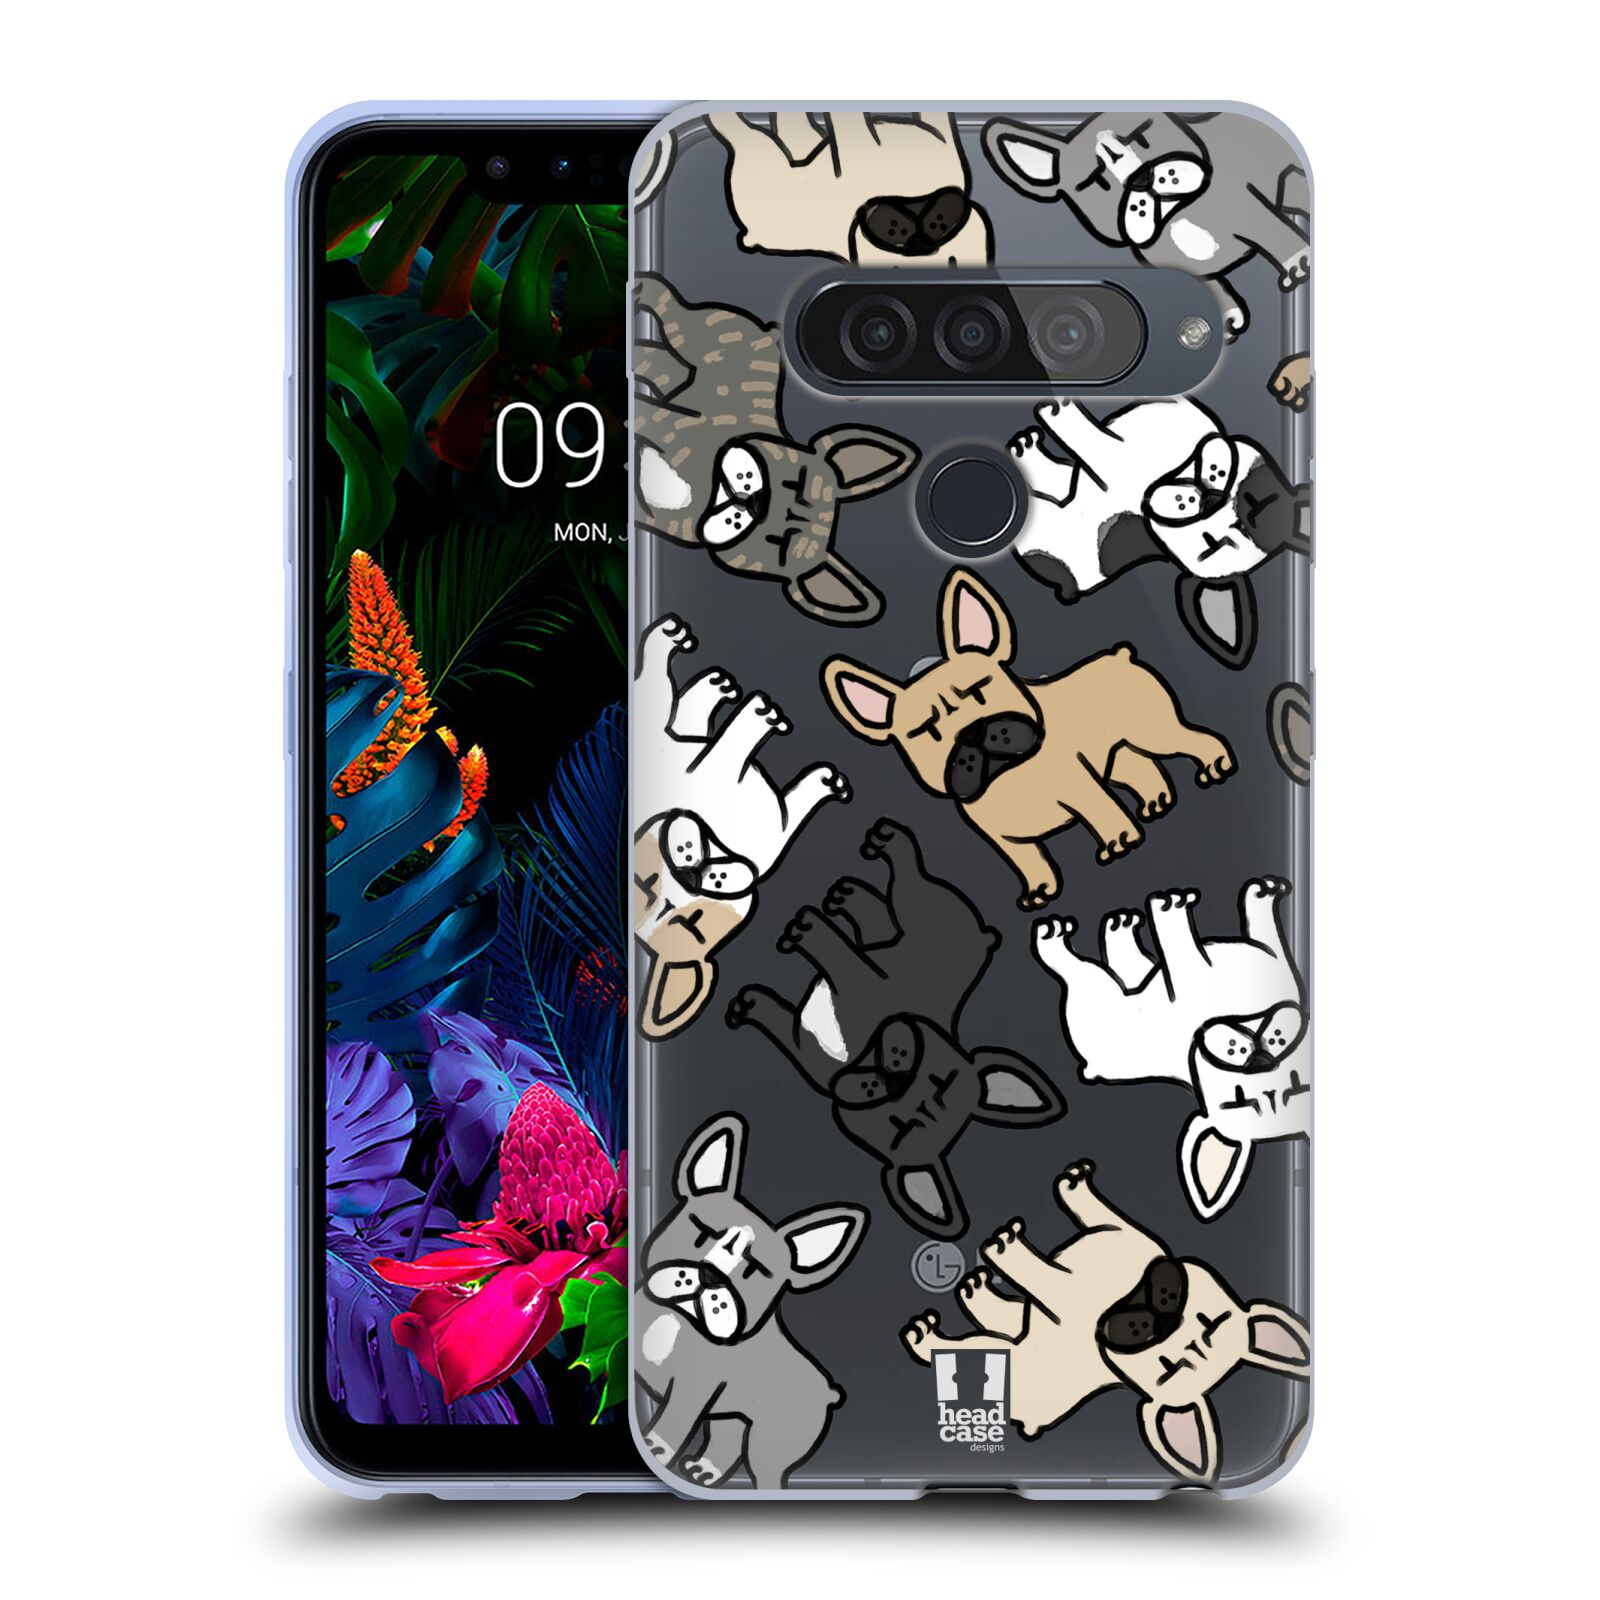 Silikonové pouzdro na mobil LG G8s ThinQ - Head Case - Francouzští buldočci